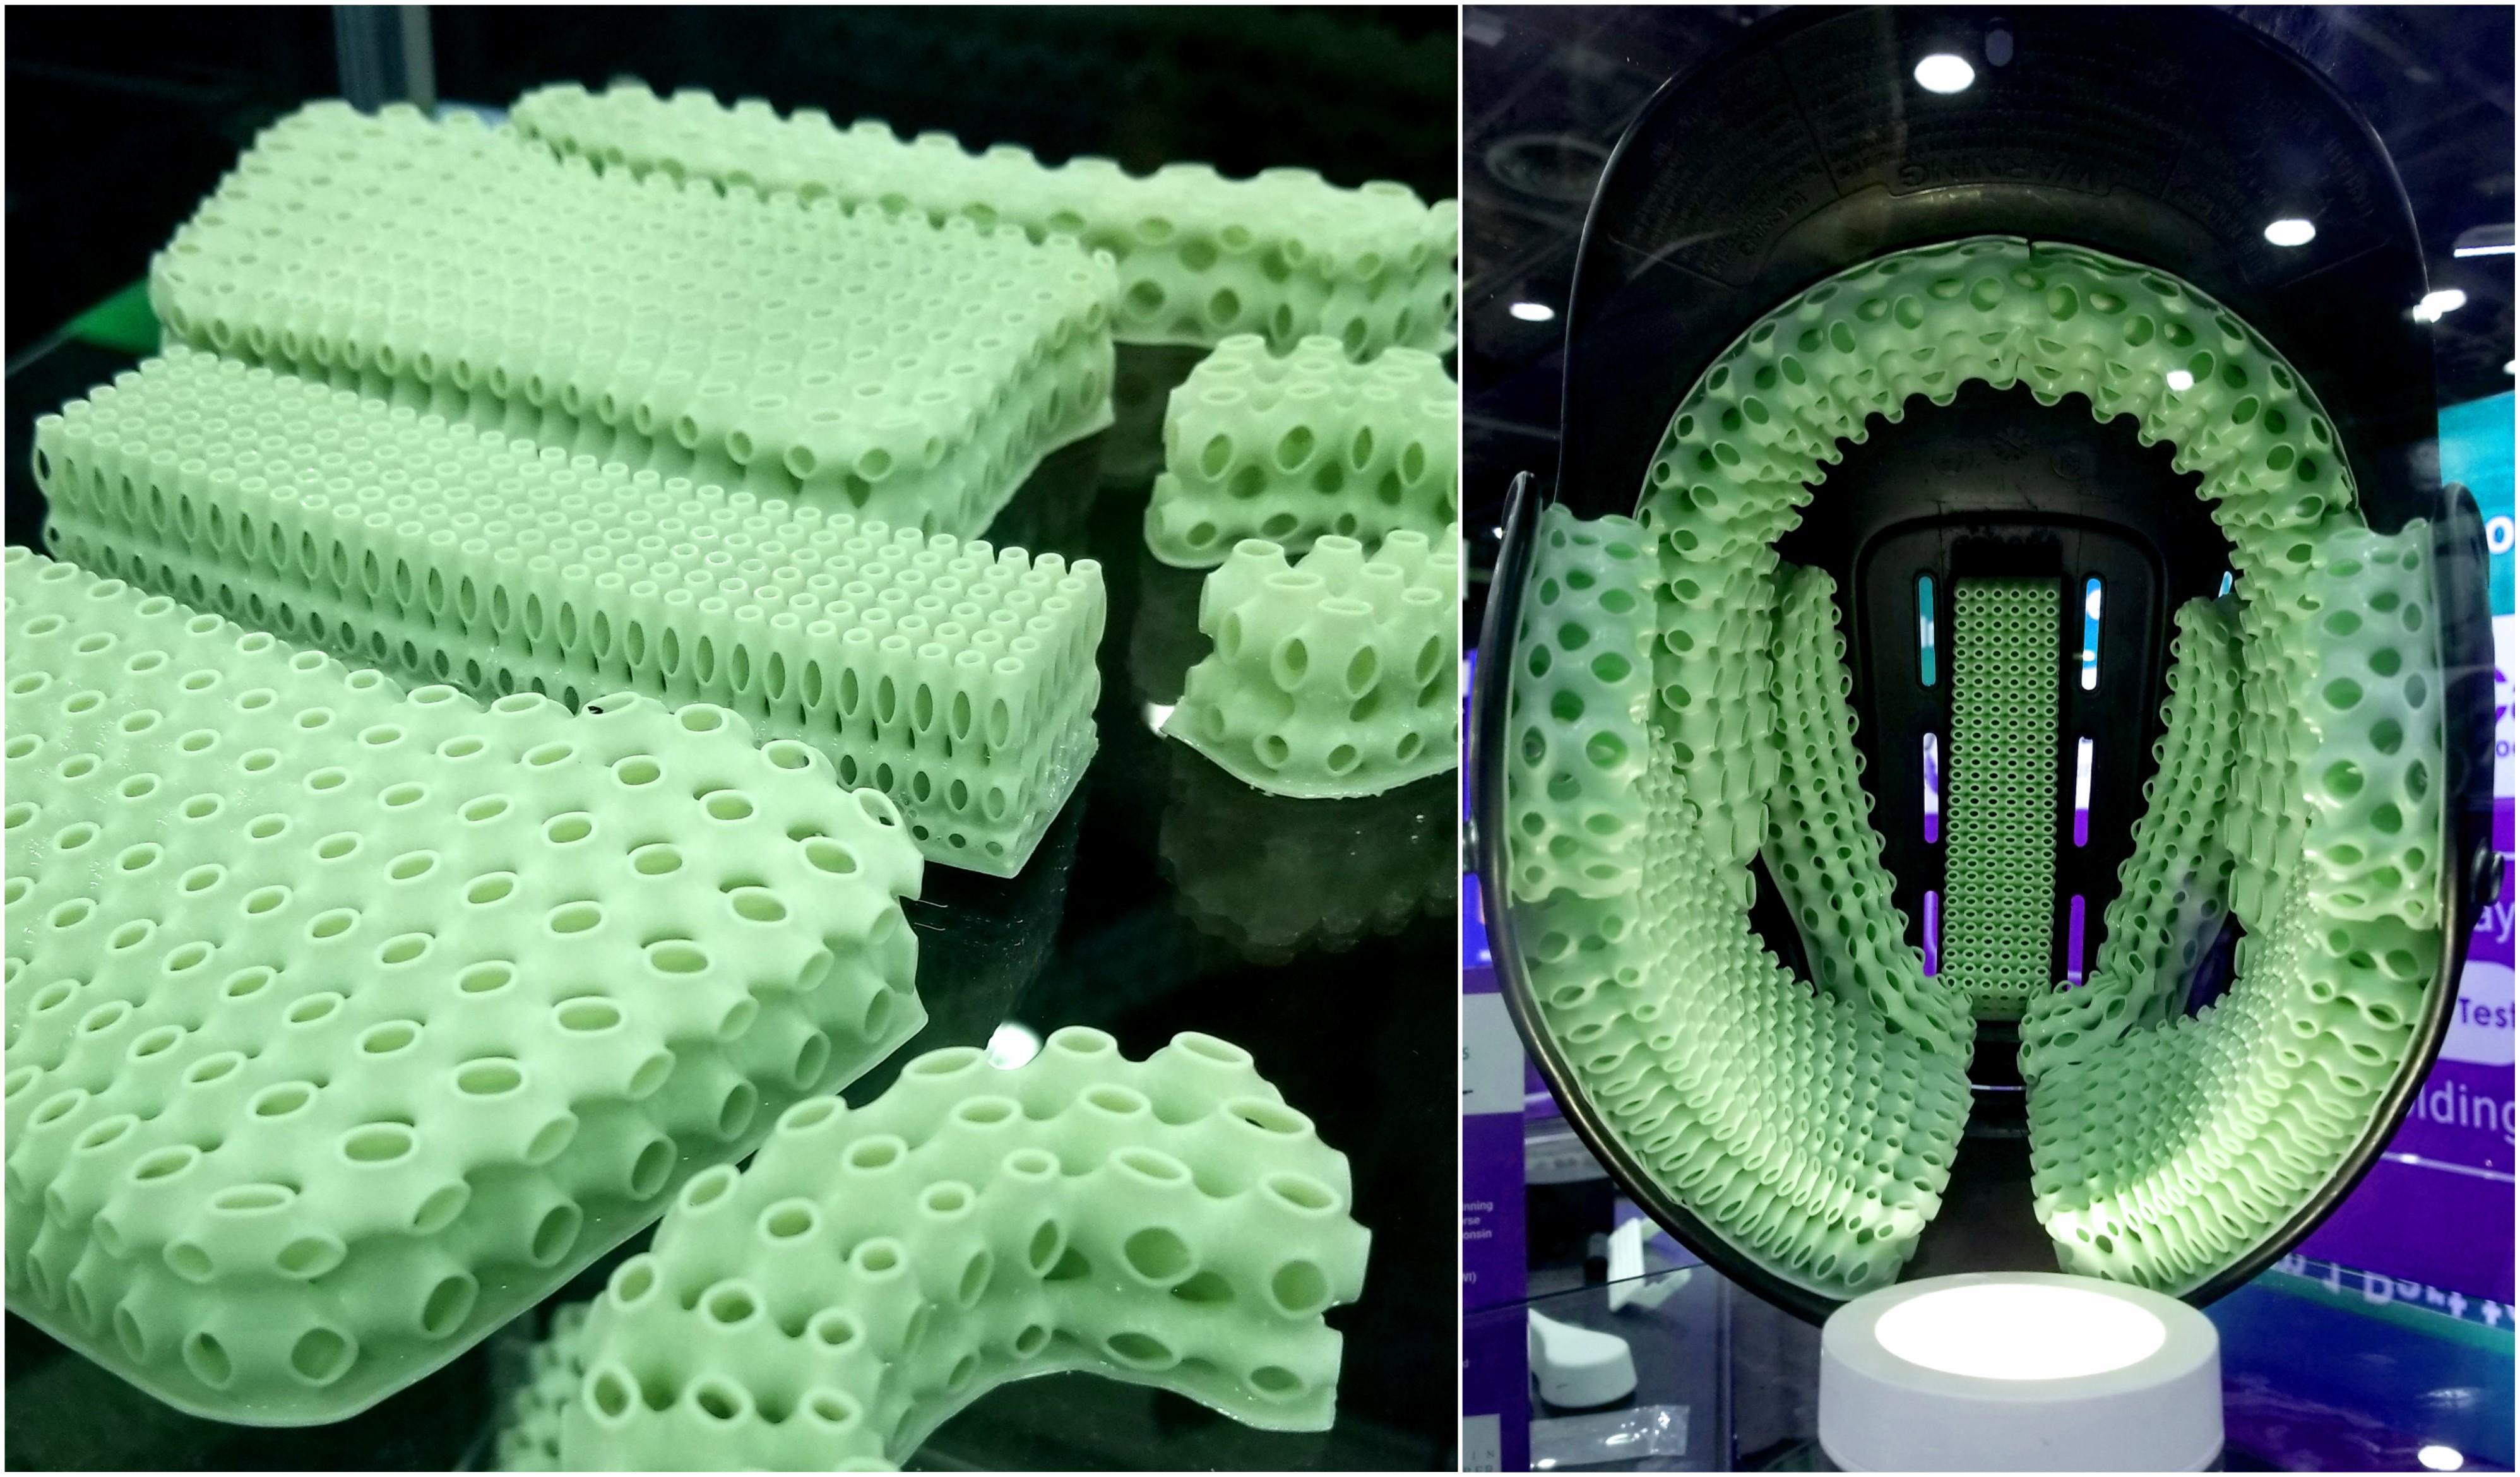 Baseball helmet with 3D printed lattice padding created as a demonstration of the company's capabilities. Photos via General Lattice